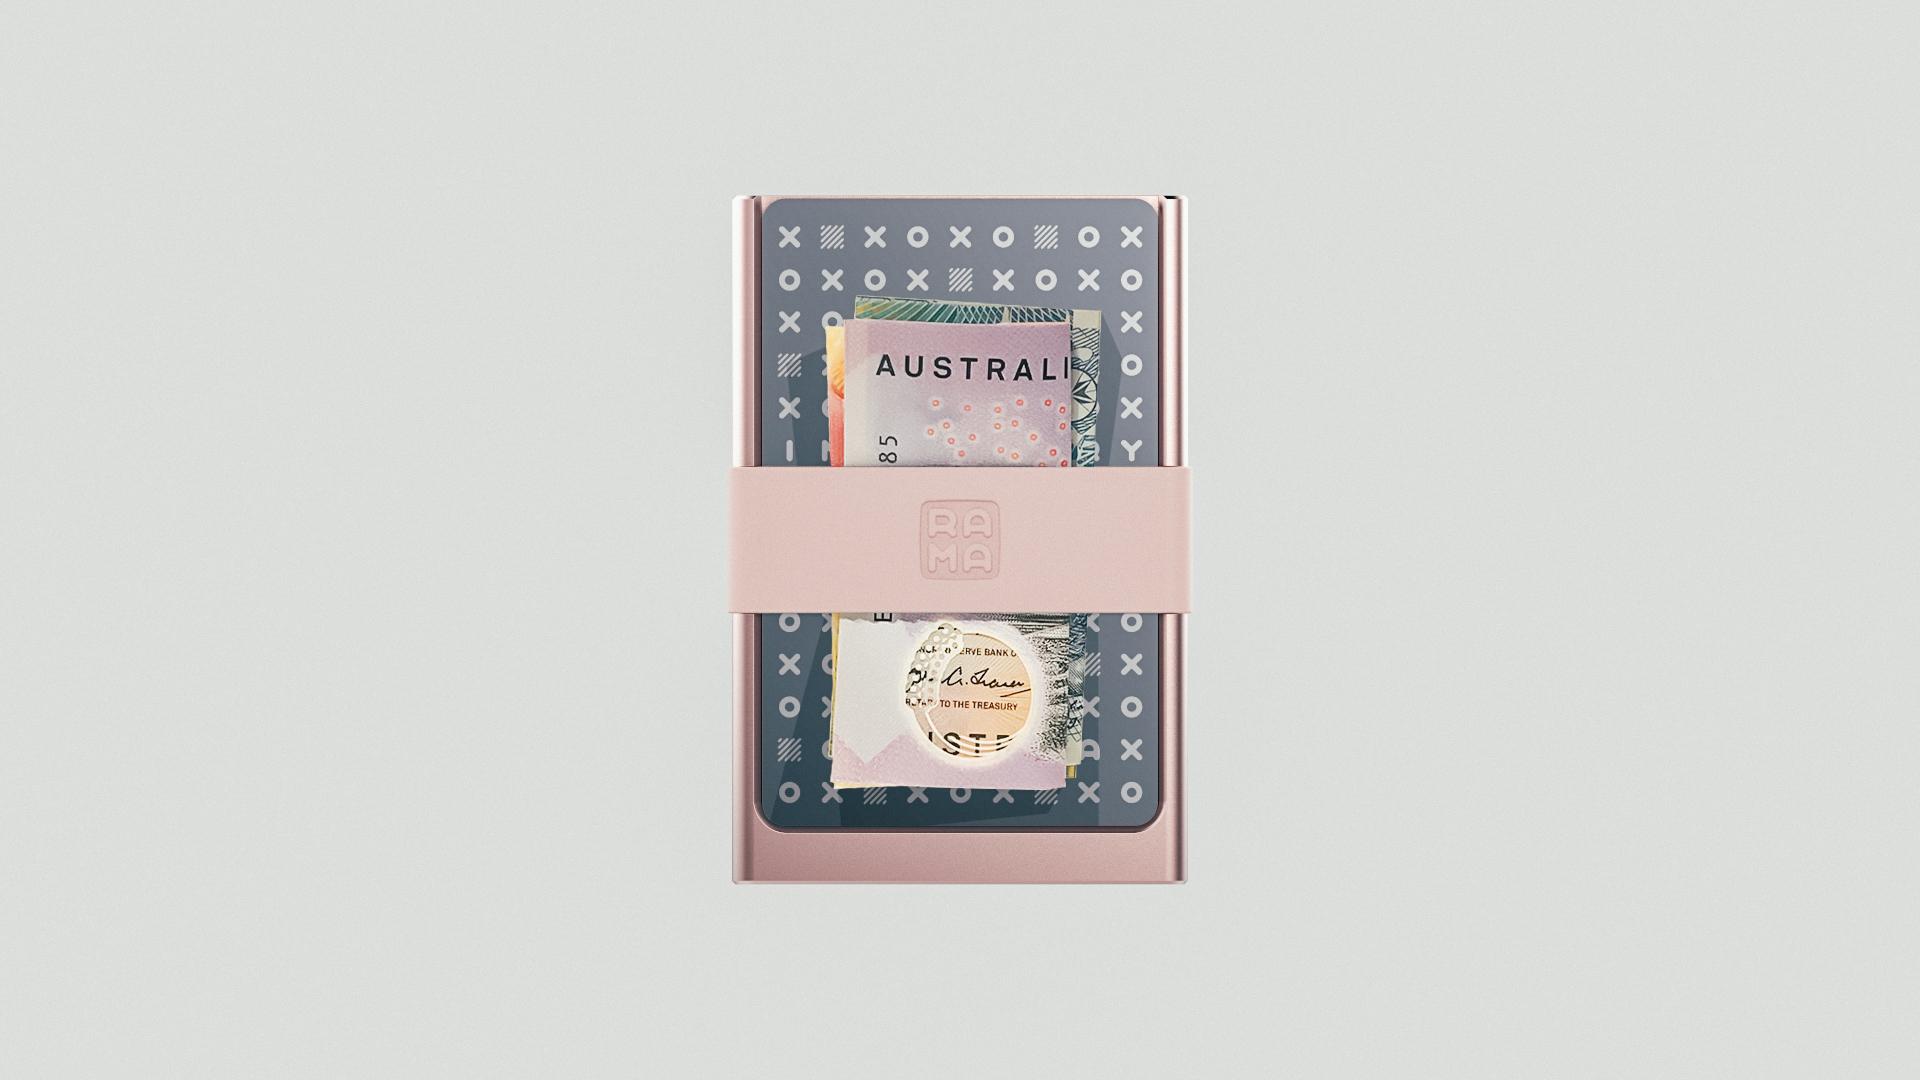 RAMA-PHOTO-RAMA-WALLET-01-W-CARD.1768-2.jpg